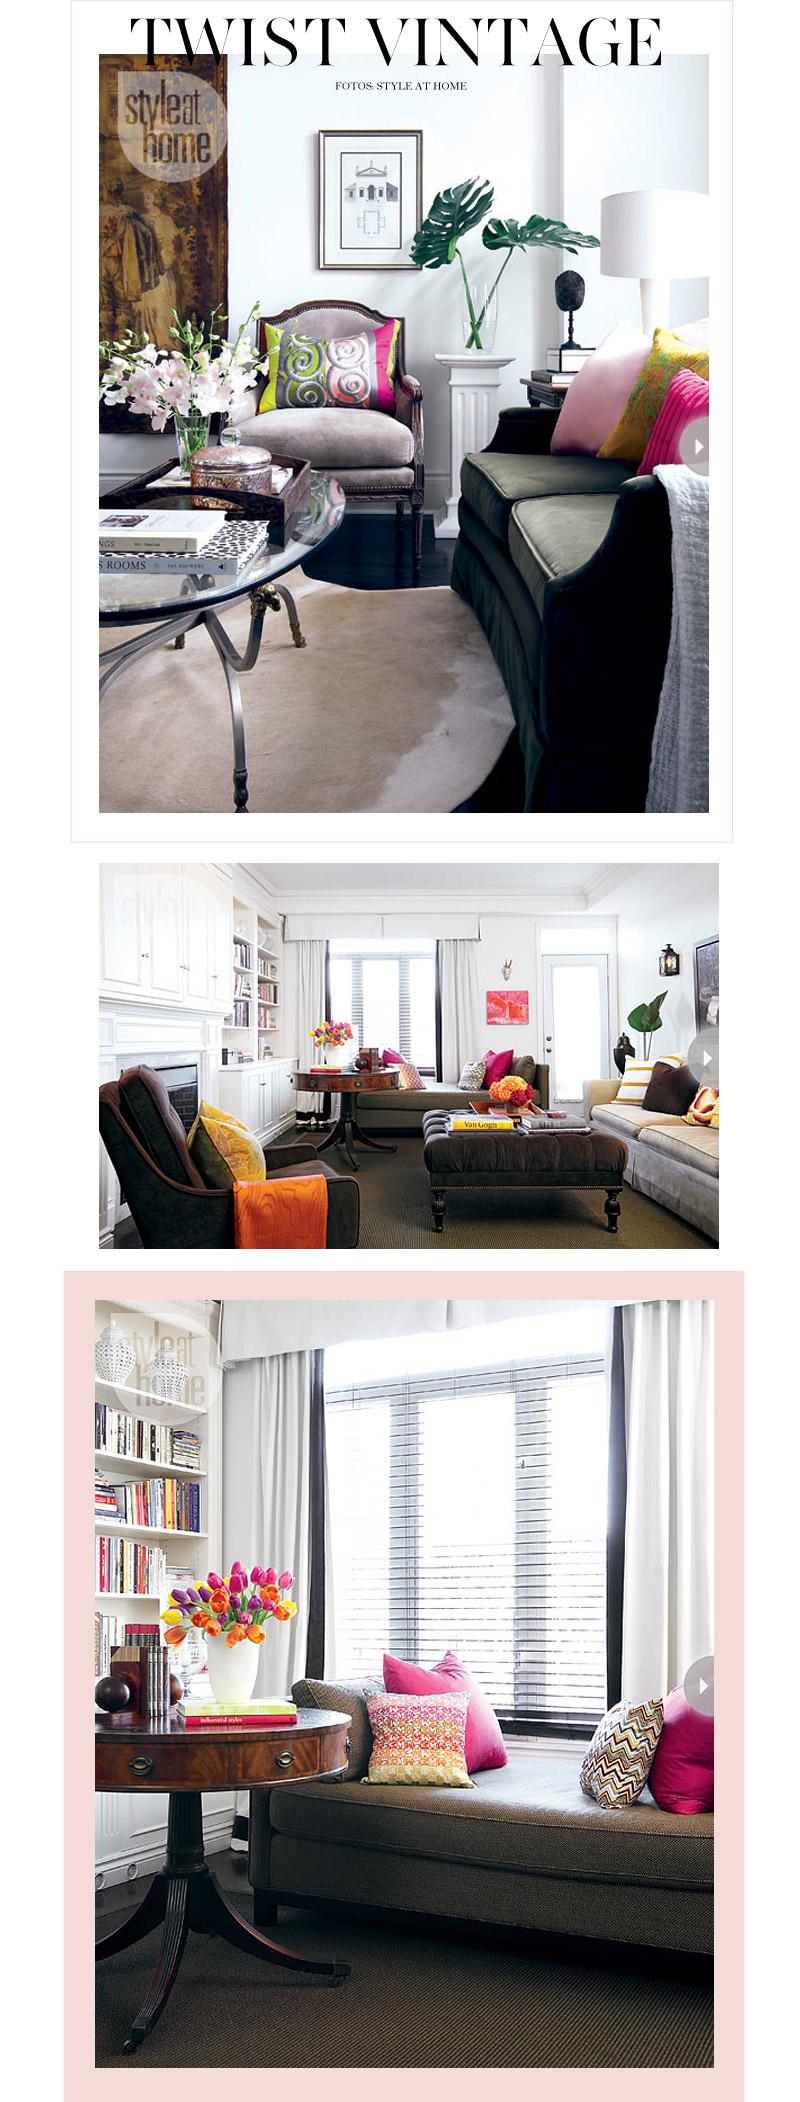 living-gazette-barbara-resende-decor-tour-apto-pequeno-vintage-sala